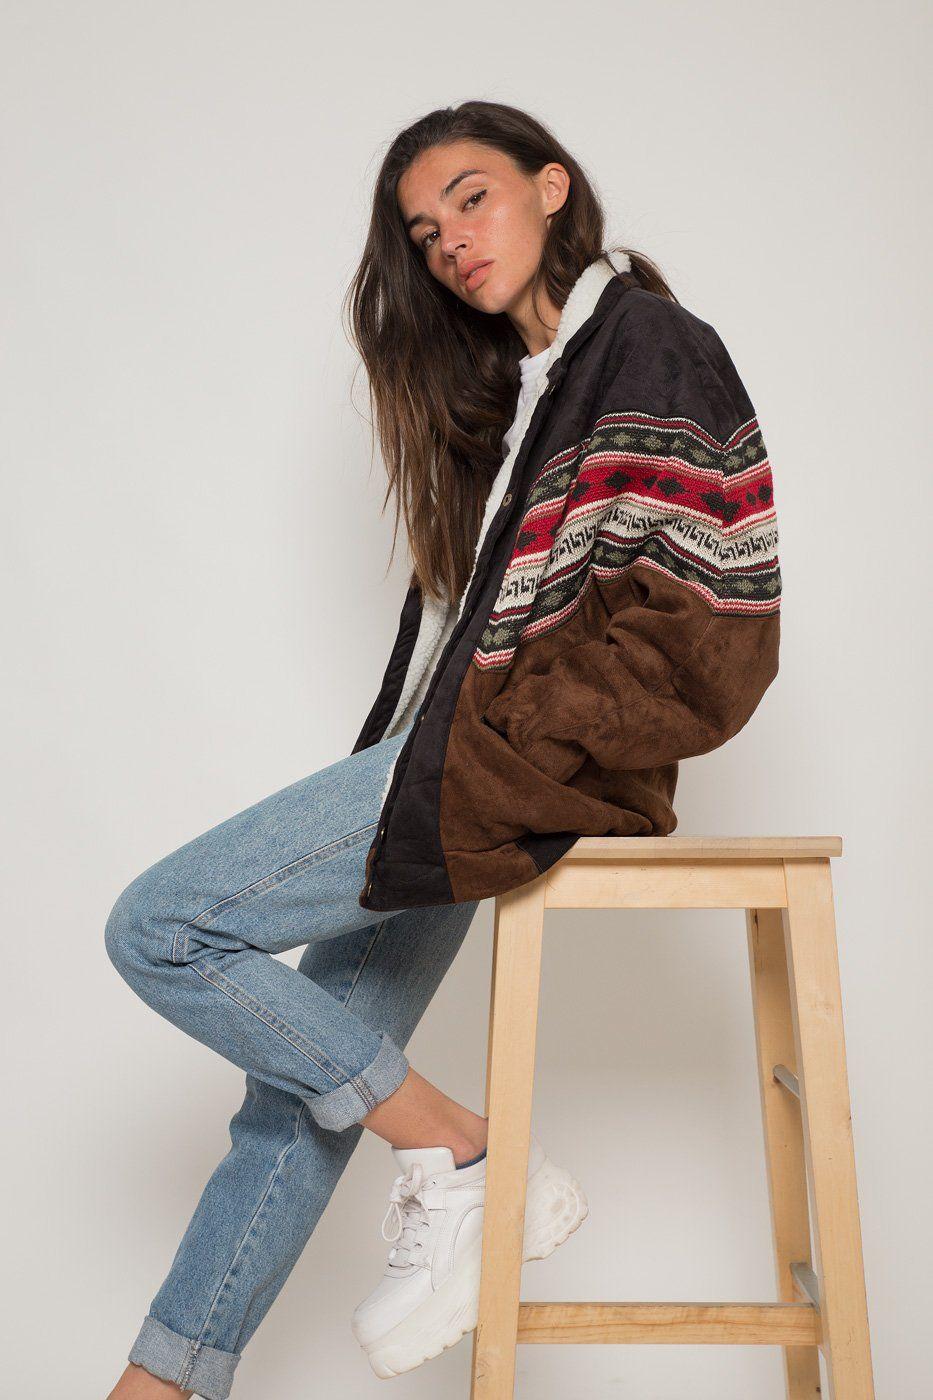 Texas Black Vegan Navajo Bomber Arizona Vintage Light Denim Jacket Green Leather Jackets Vintage Outfits [ 1400 x 933 Pixel ]